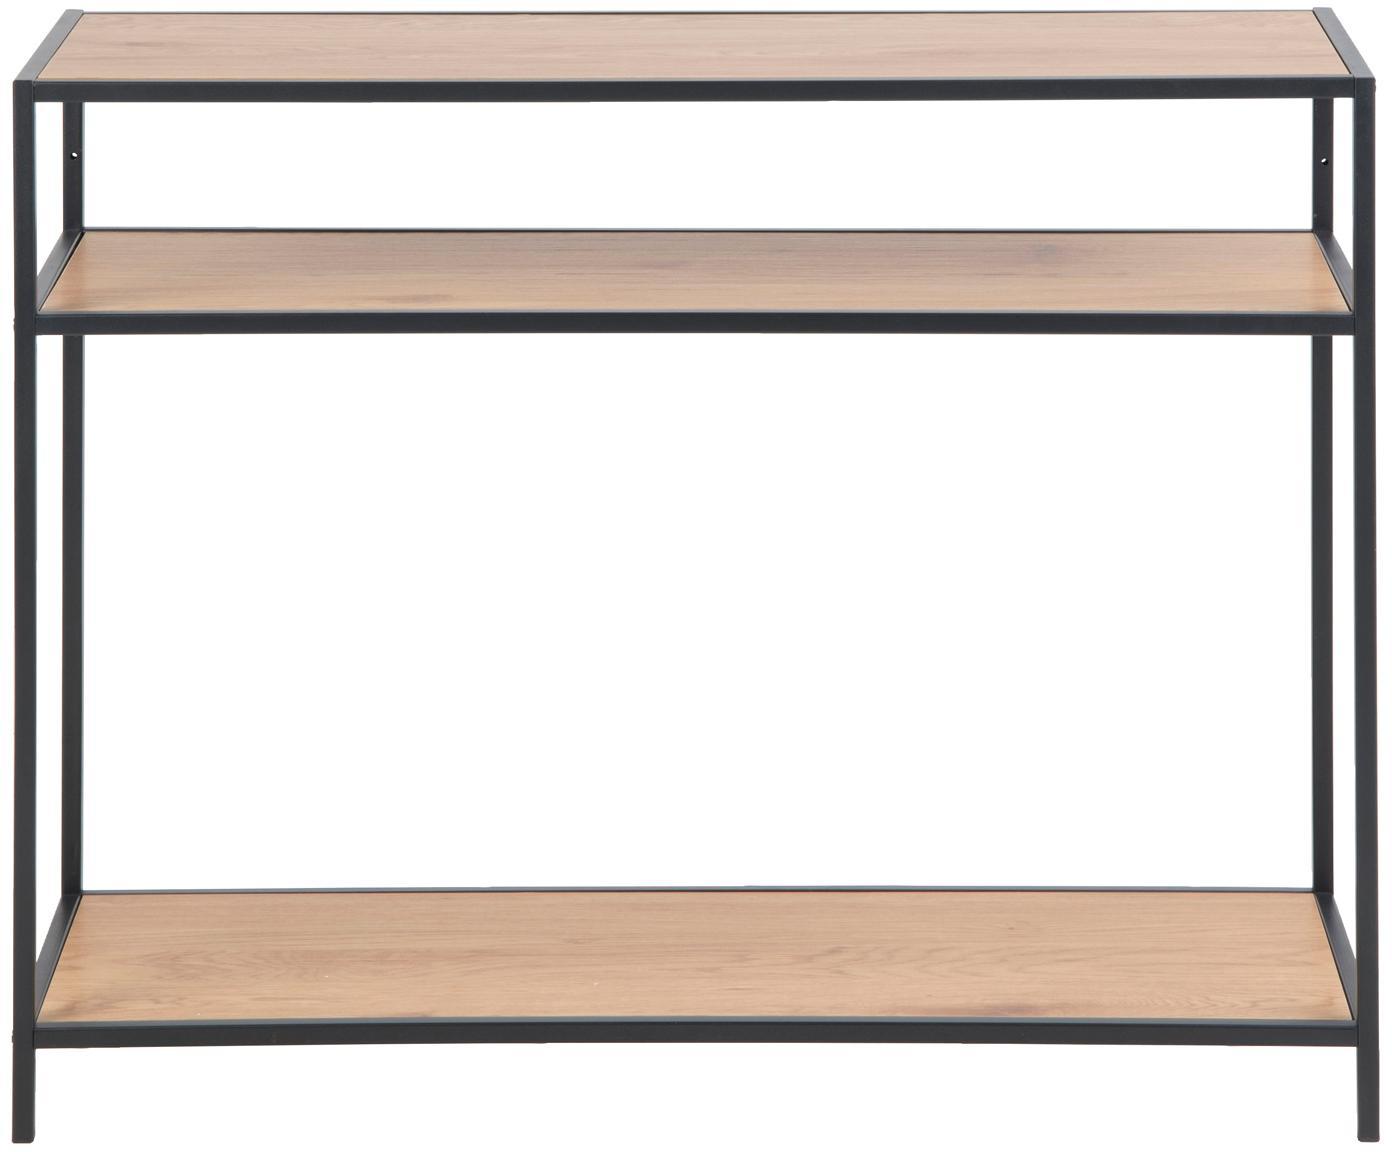 Sidetable Seaford met 3 plateaus, Frame: gepoedercoat metaal, Planken: eikenhoutkleurig. Frame: zwart, B 100 x D 35 cm